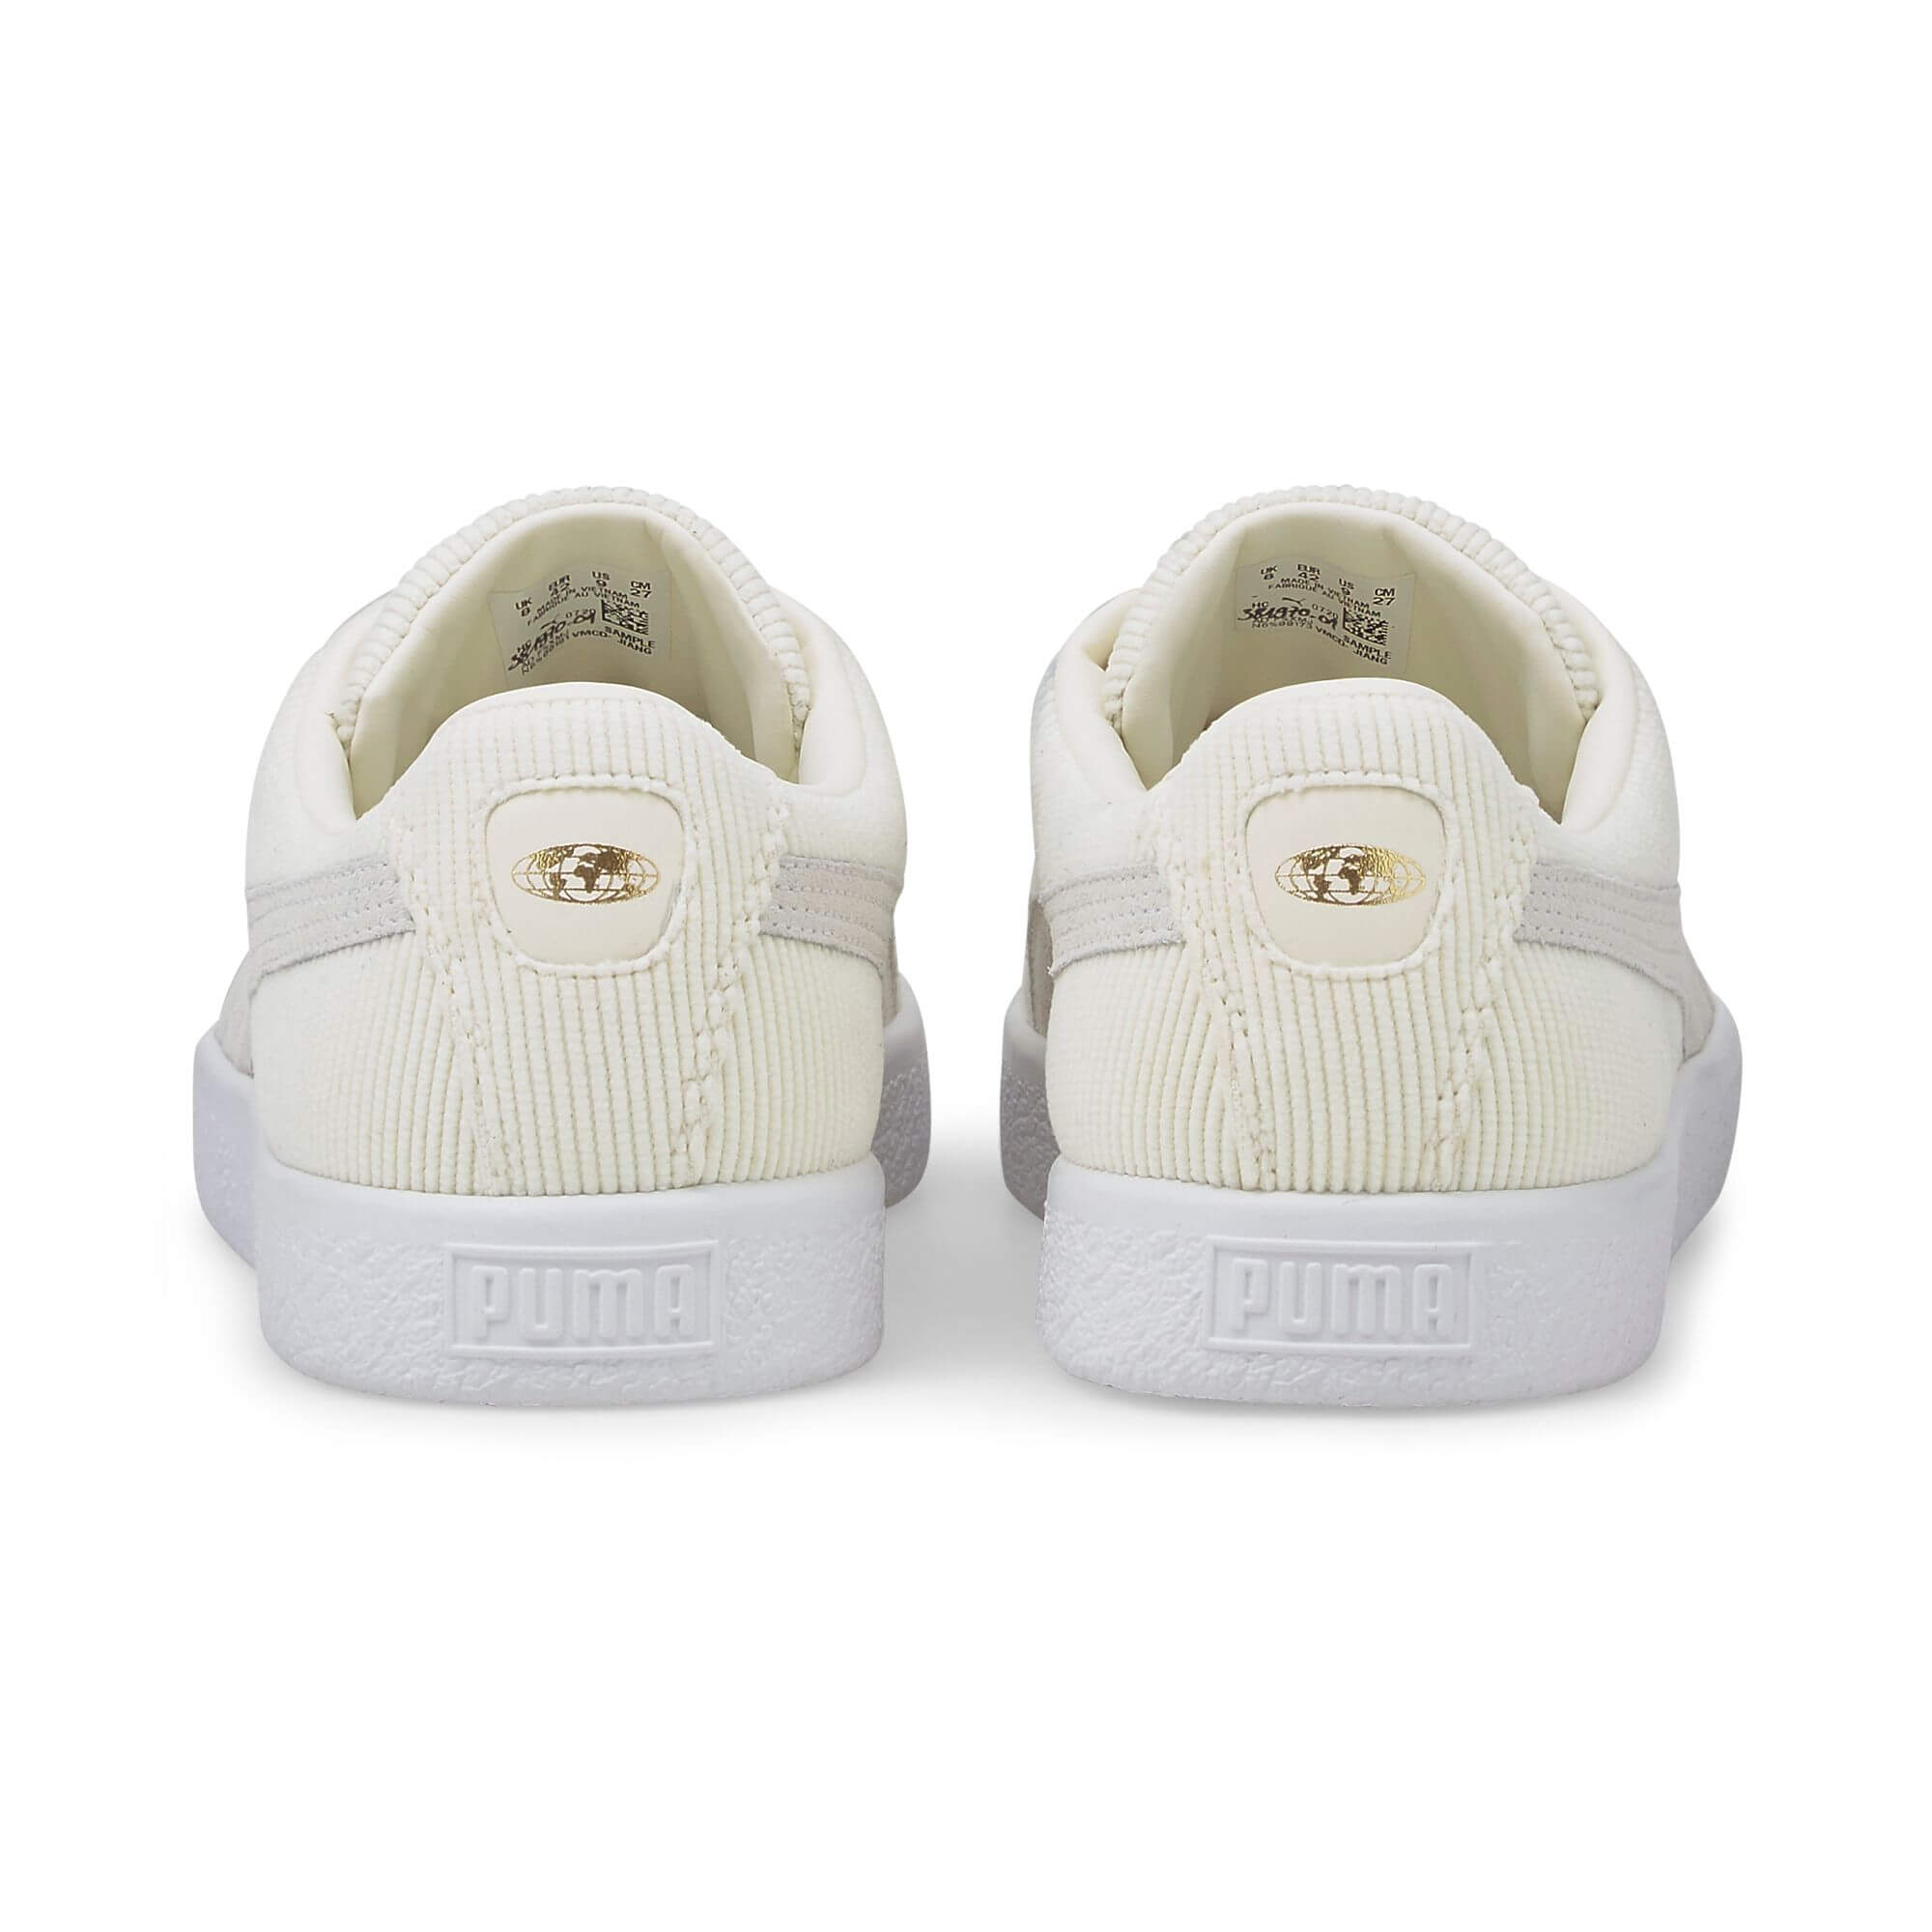 "heel view - PUMA x BUTTERGOODS- Basket Vintage - ""Cord"""